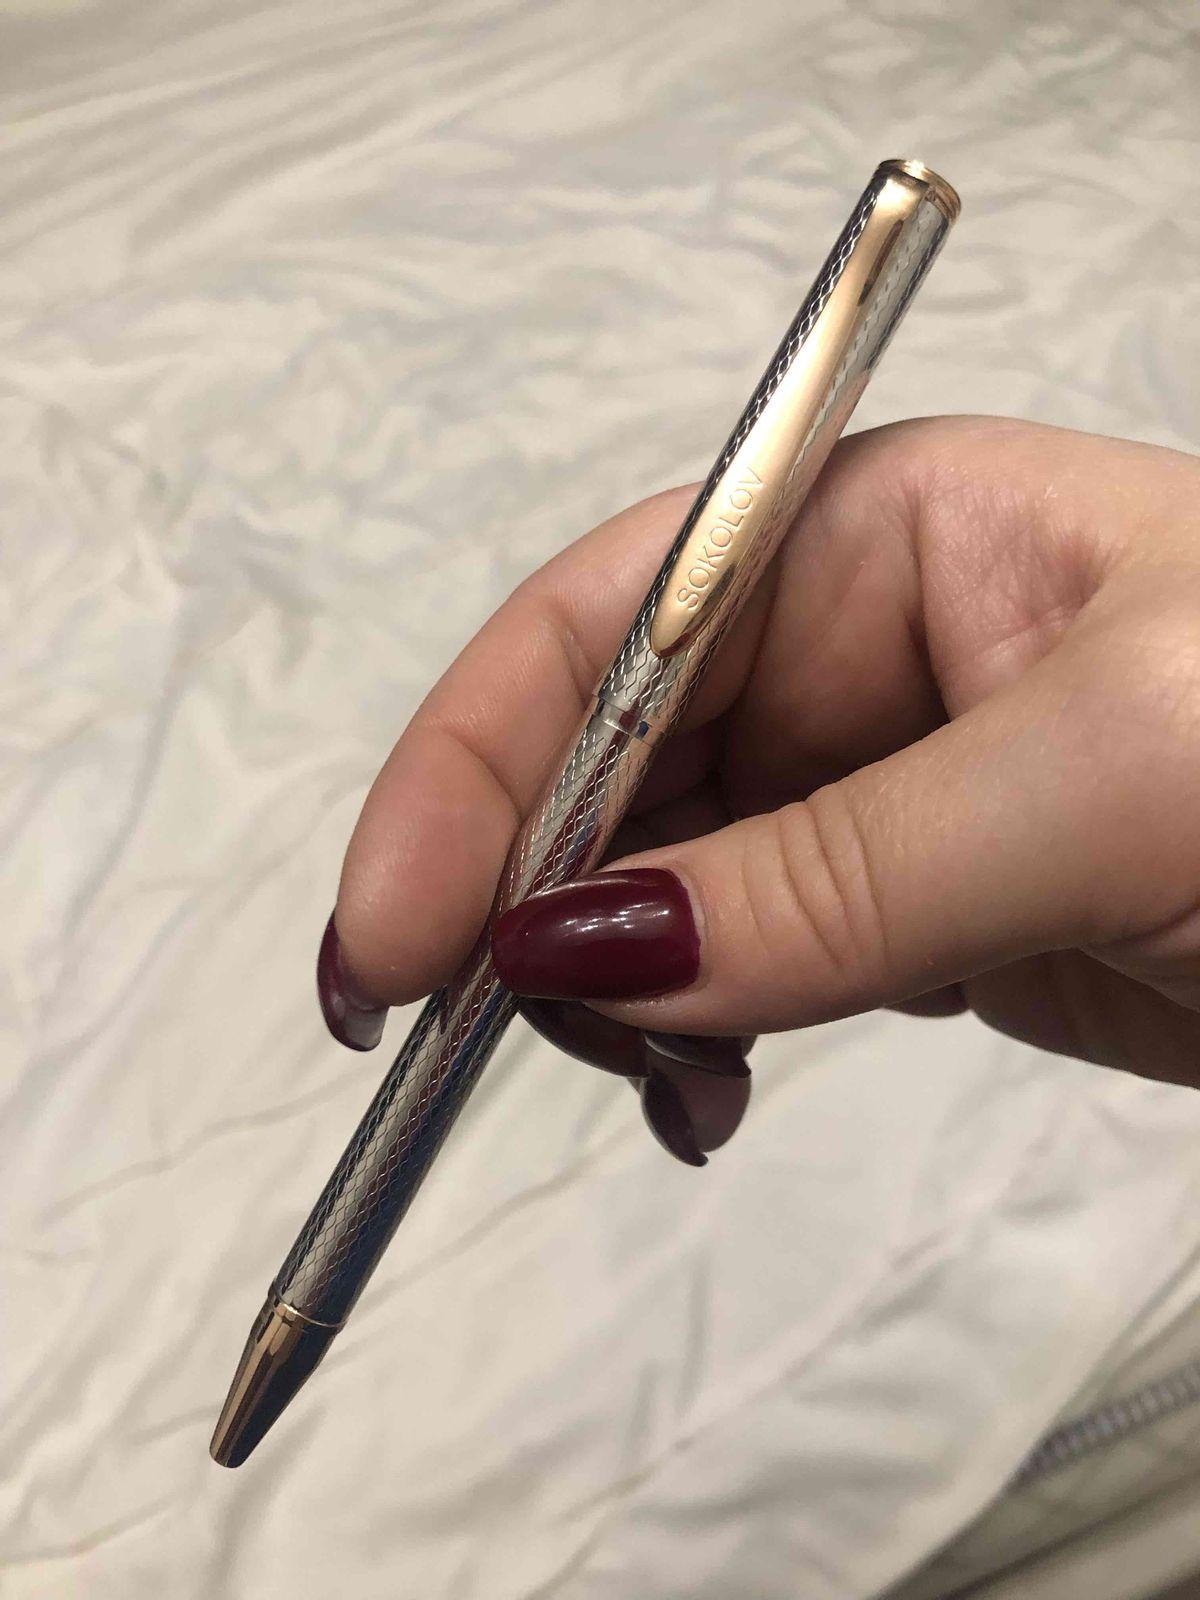 Крутая ручка!